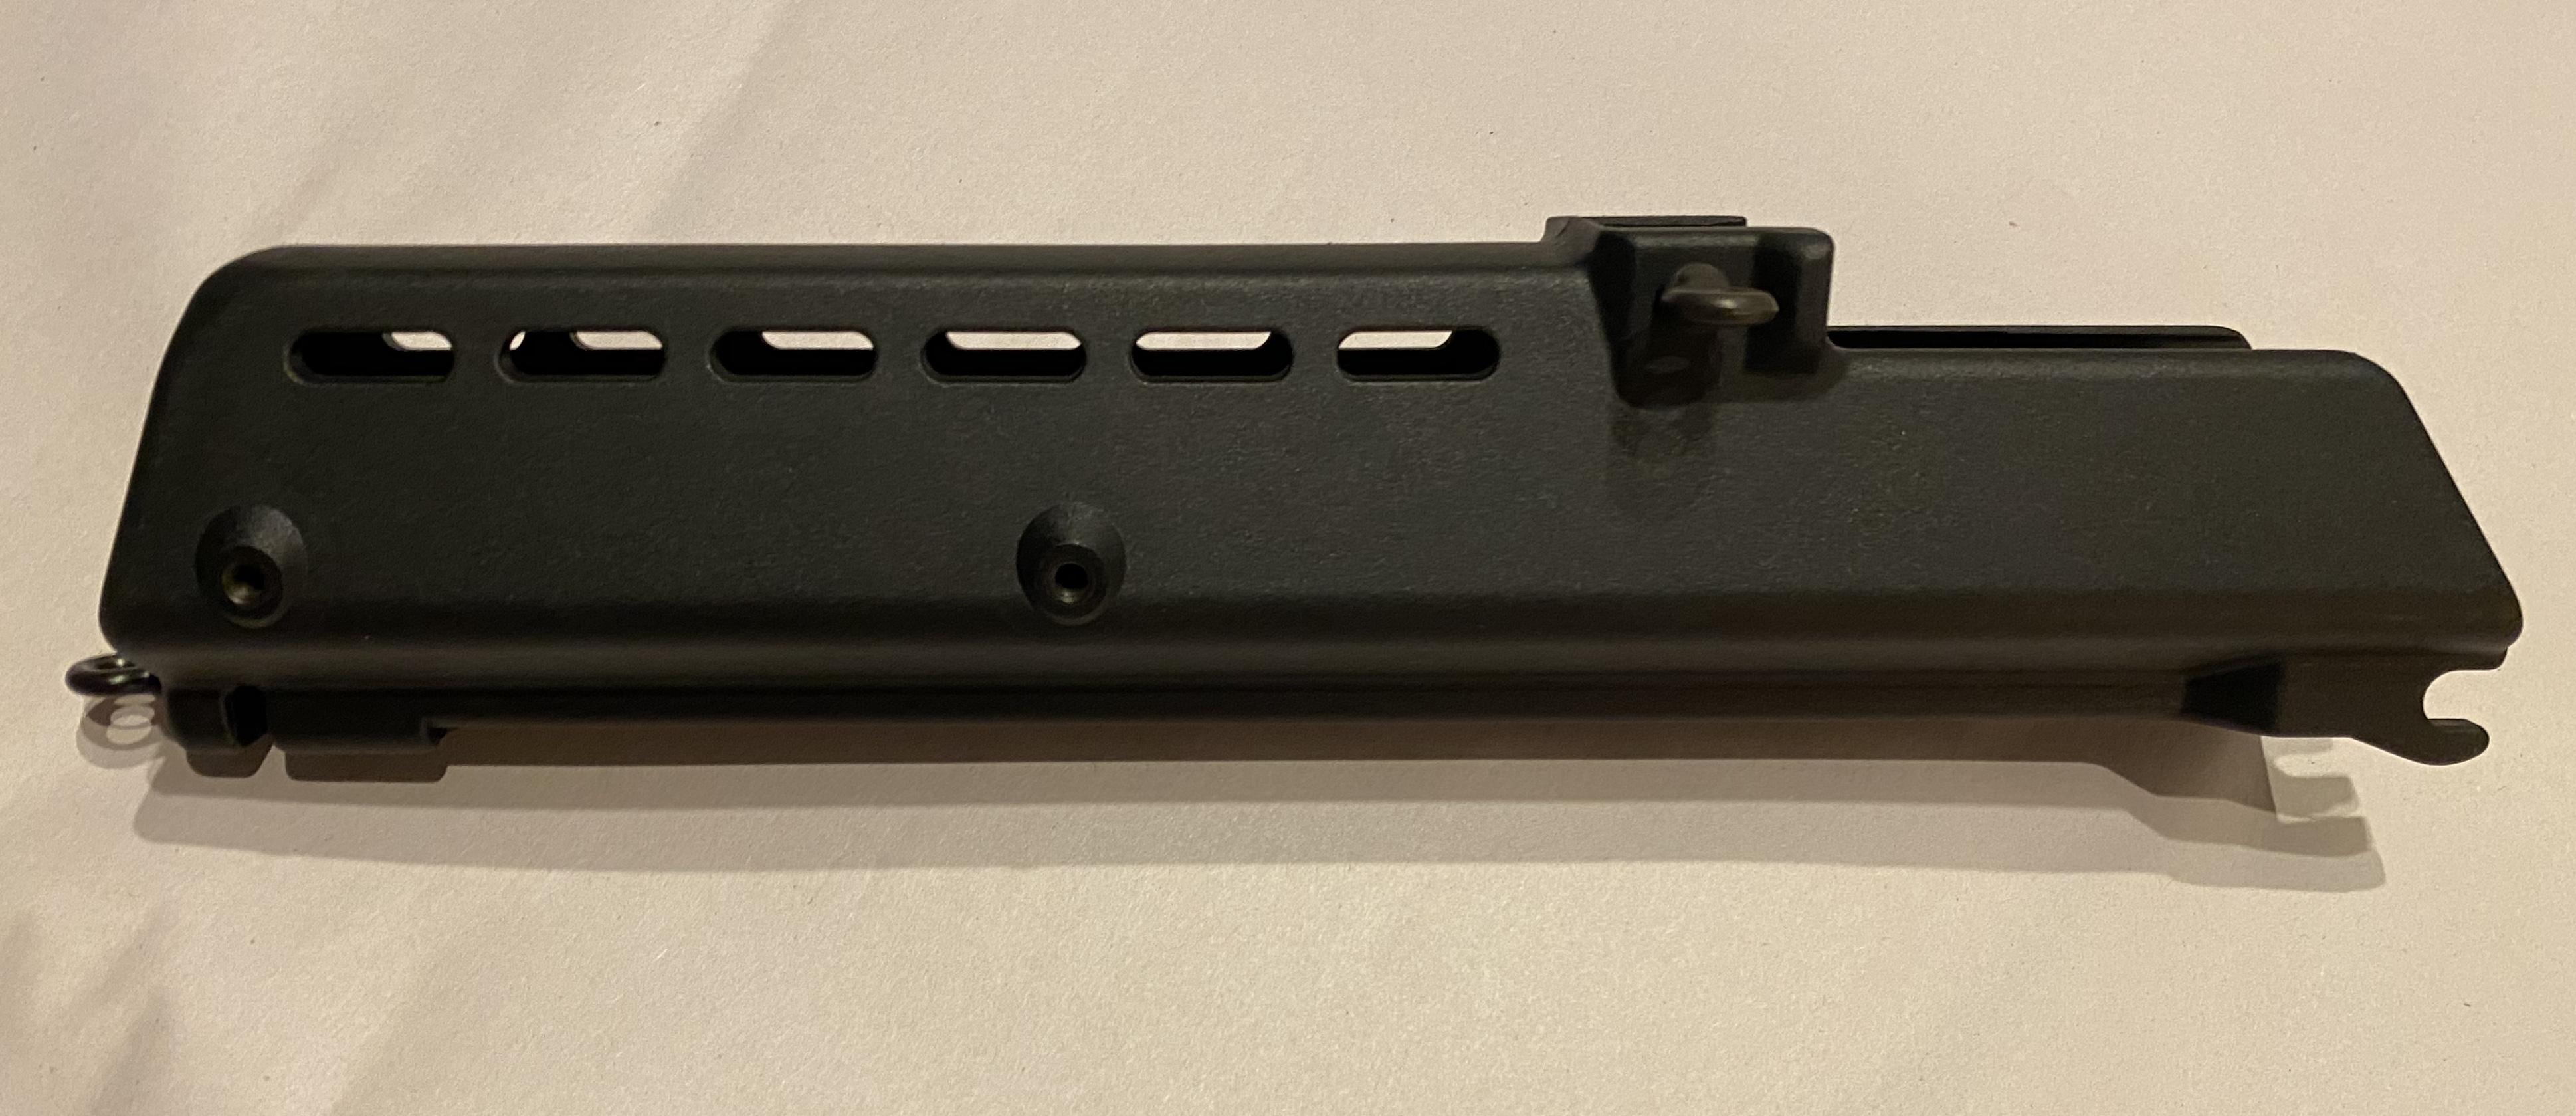 WTS: Parts list-G36E/K handguards, sight rails, G28 FH, MR556/416 stock/grip, VP9/P30-629f116b-7994-4035-a3ba-76e8535c3343.jpeg